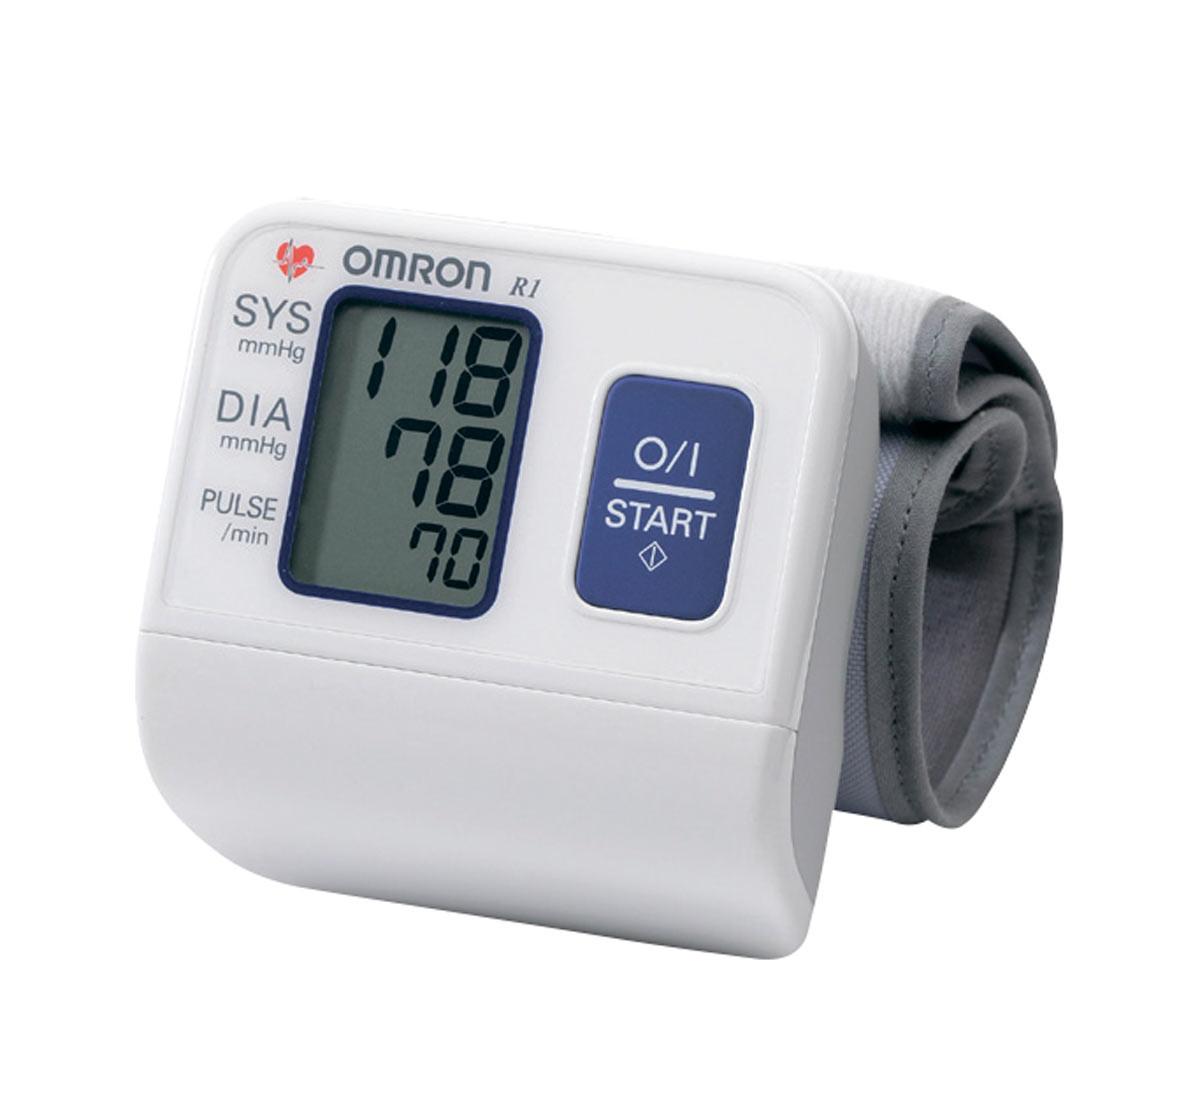 Тонометр автоматический с манжетой на запястье OMRON R1